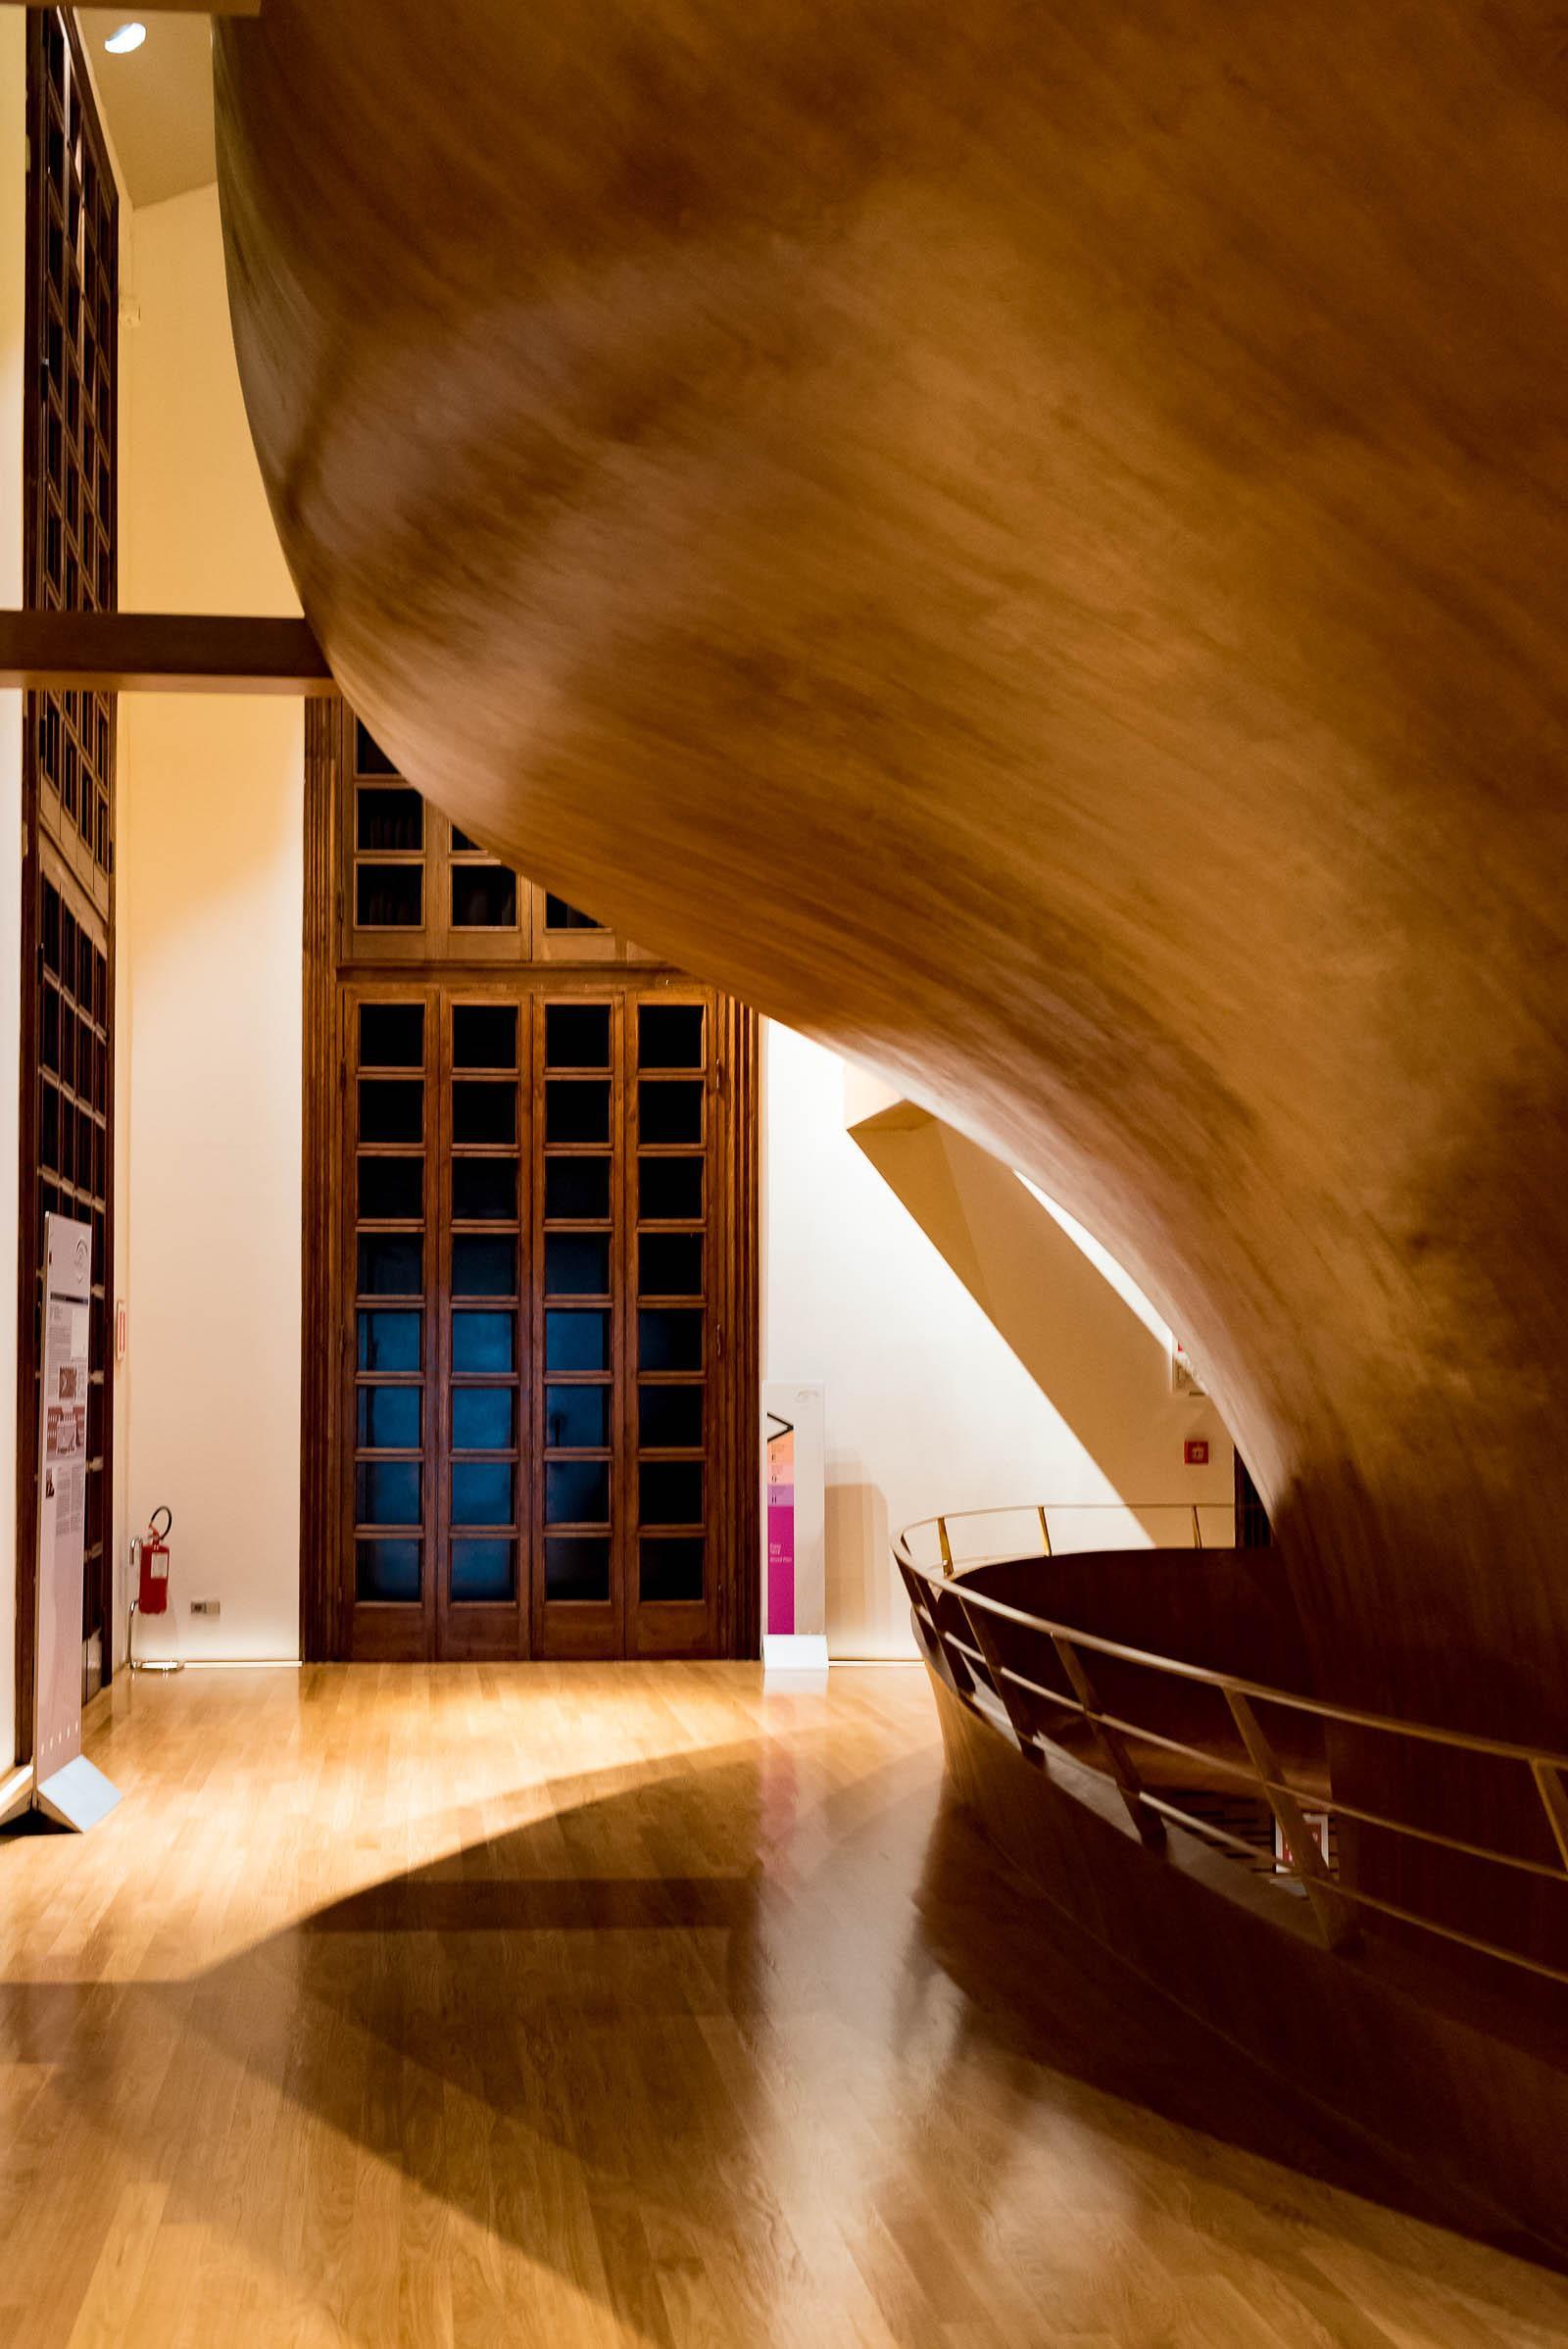 Cremona Italy Violin Museum